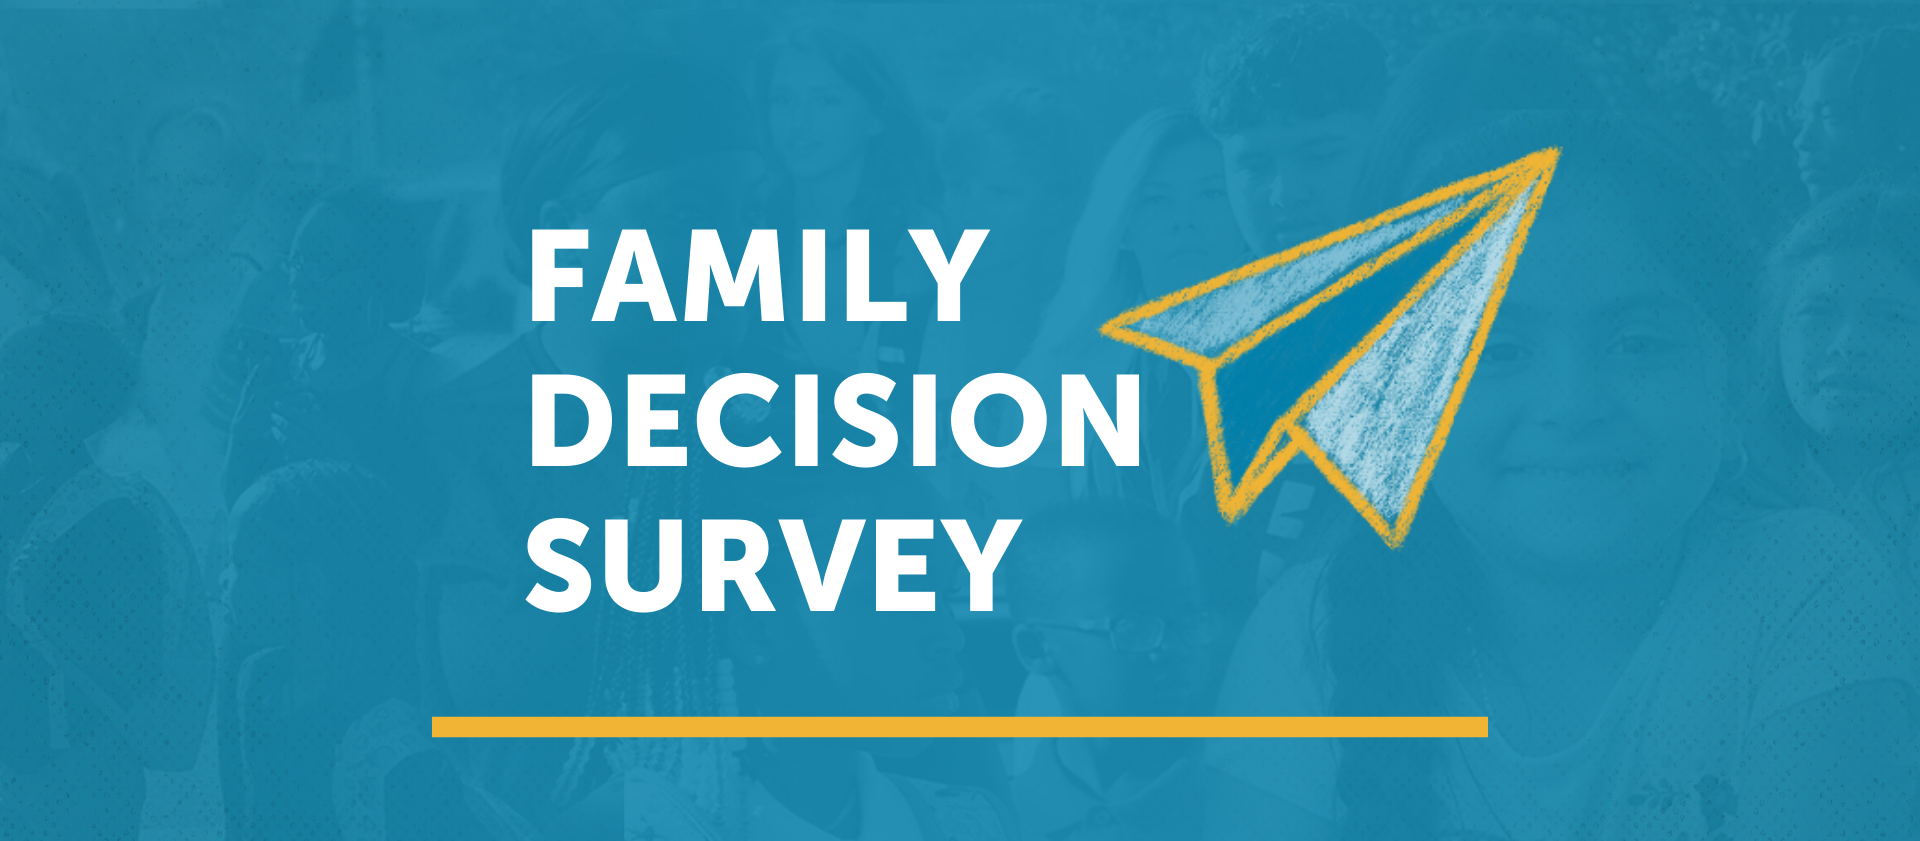 Family Decision Survey: Due September 15